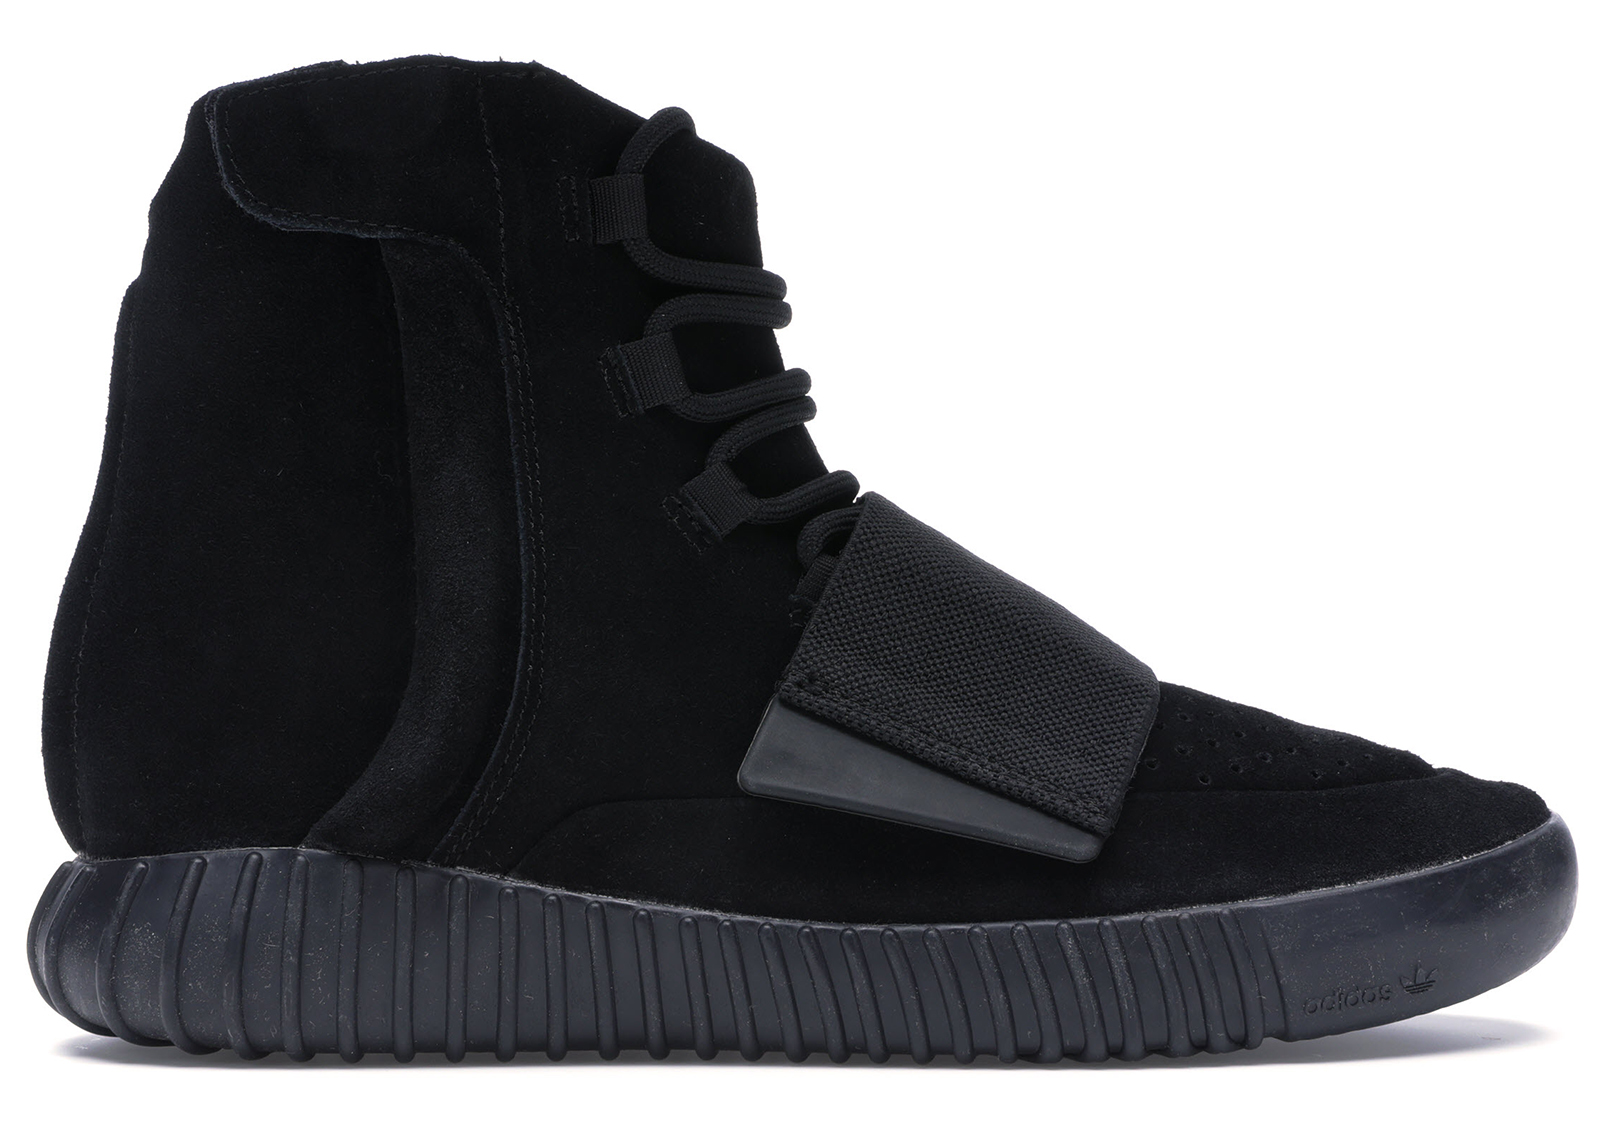 adidas Yeezy Boost 750 Triple Black - BB1839